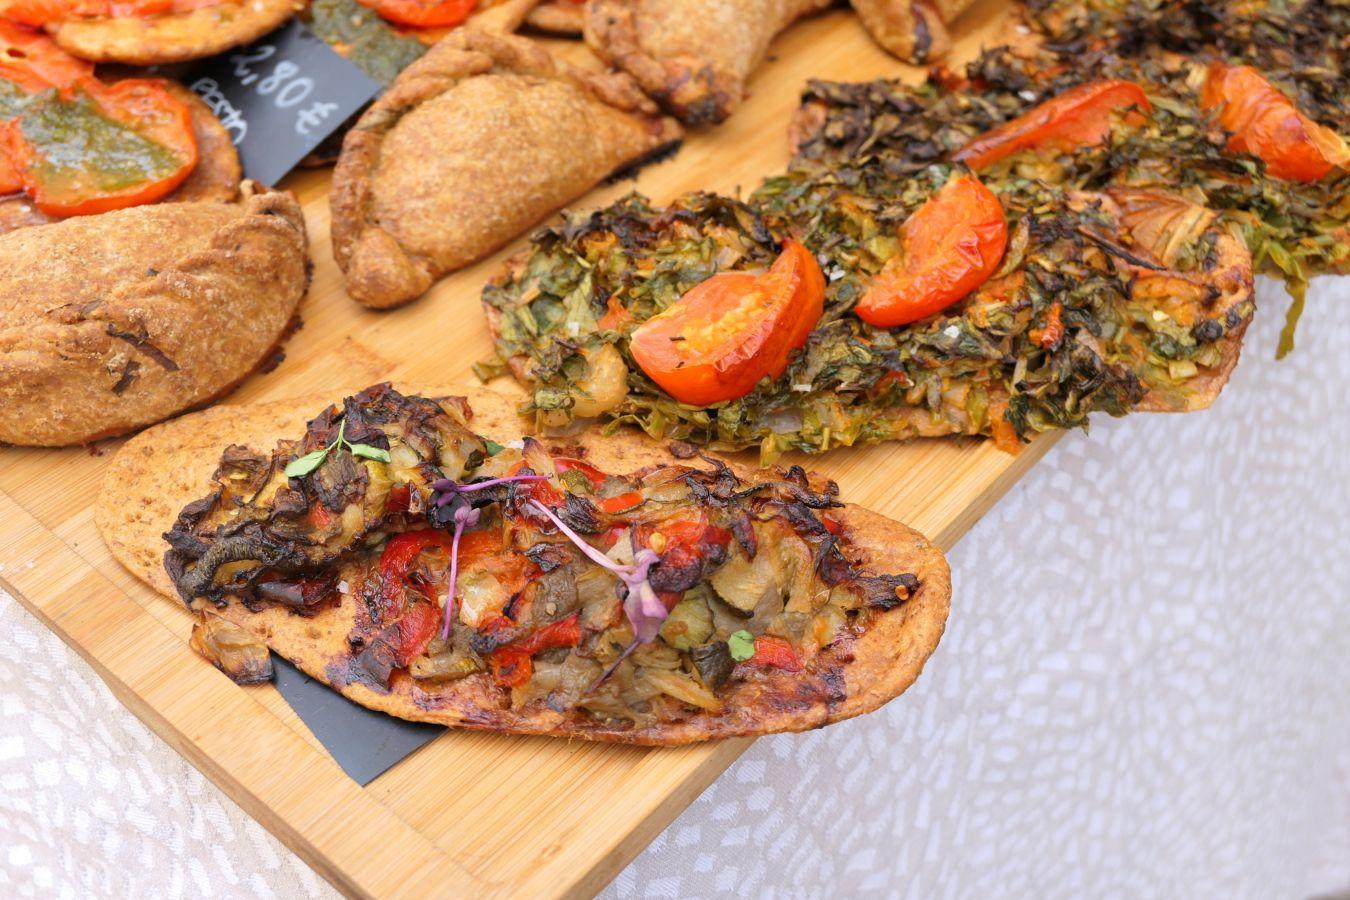 Falsos vegetarianos de la cocina mallorquina | Gastronomadistas